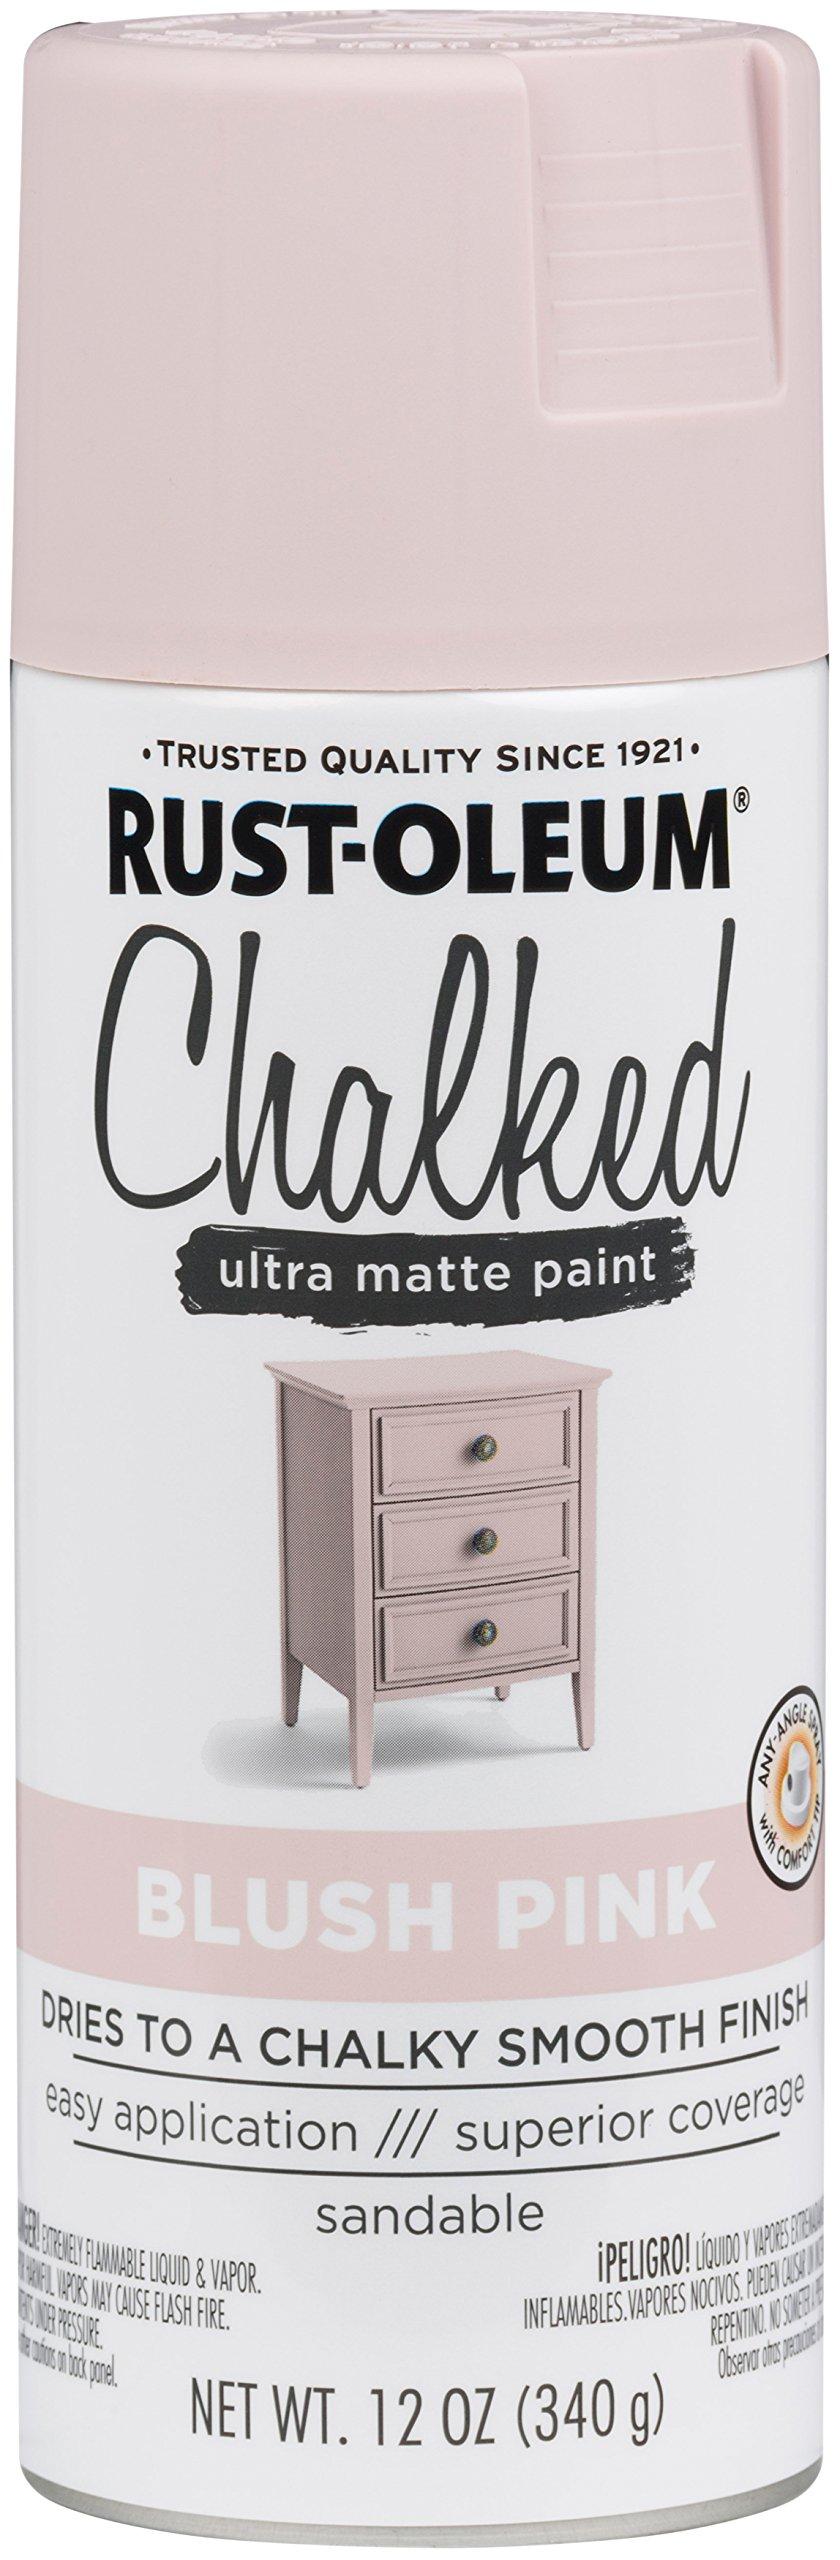 Rust-Oleum 302594 Series Chalked Ultra Matte Spray Paint, 12oz, Blush Pink